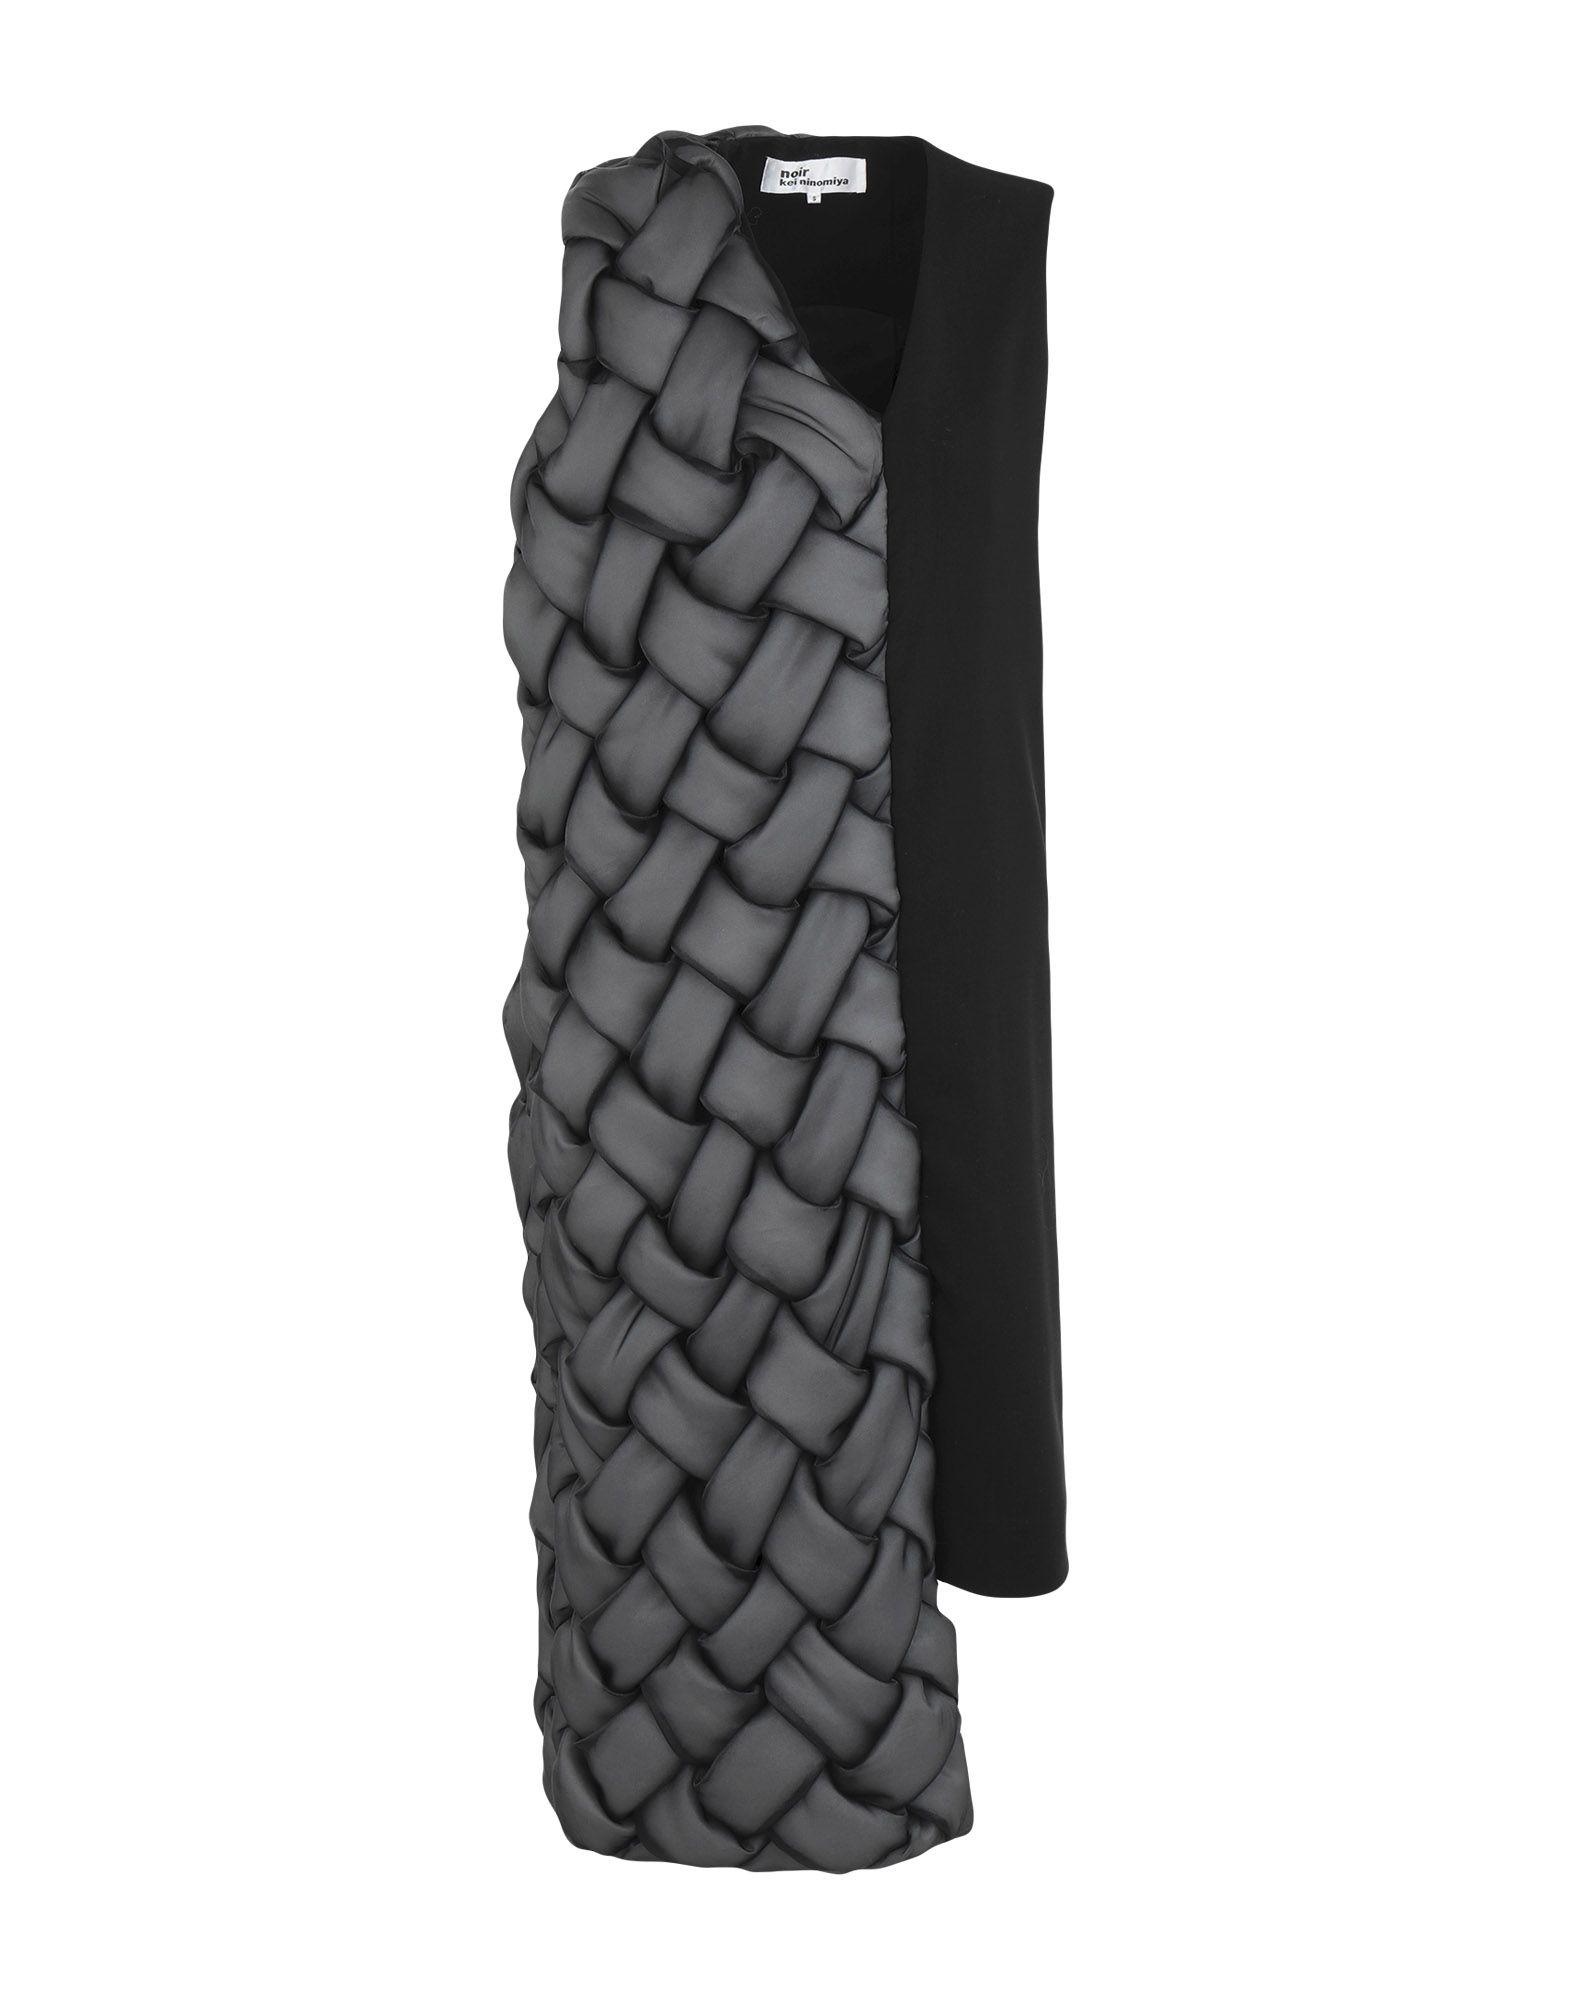 Фото - NOIR KEI NINOMIYA Платье длиной 3/4 noir kei ninomiya блузка